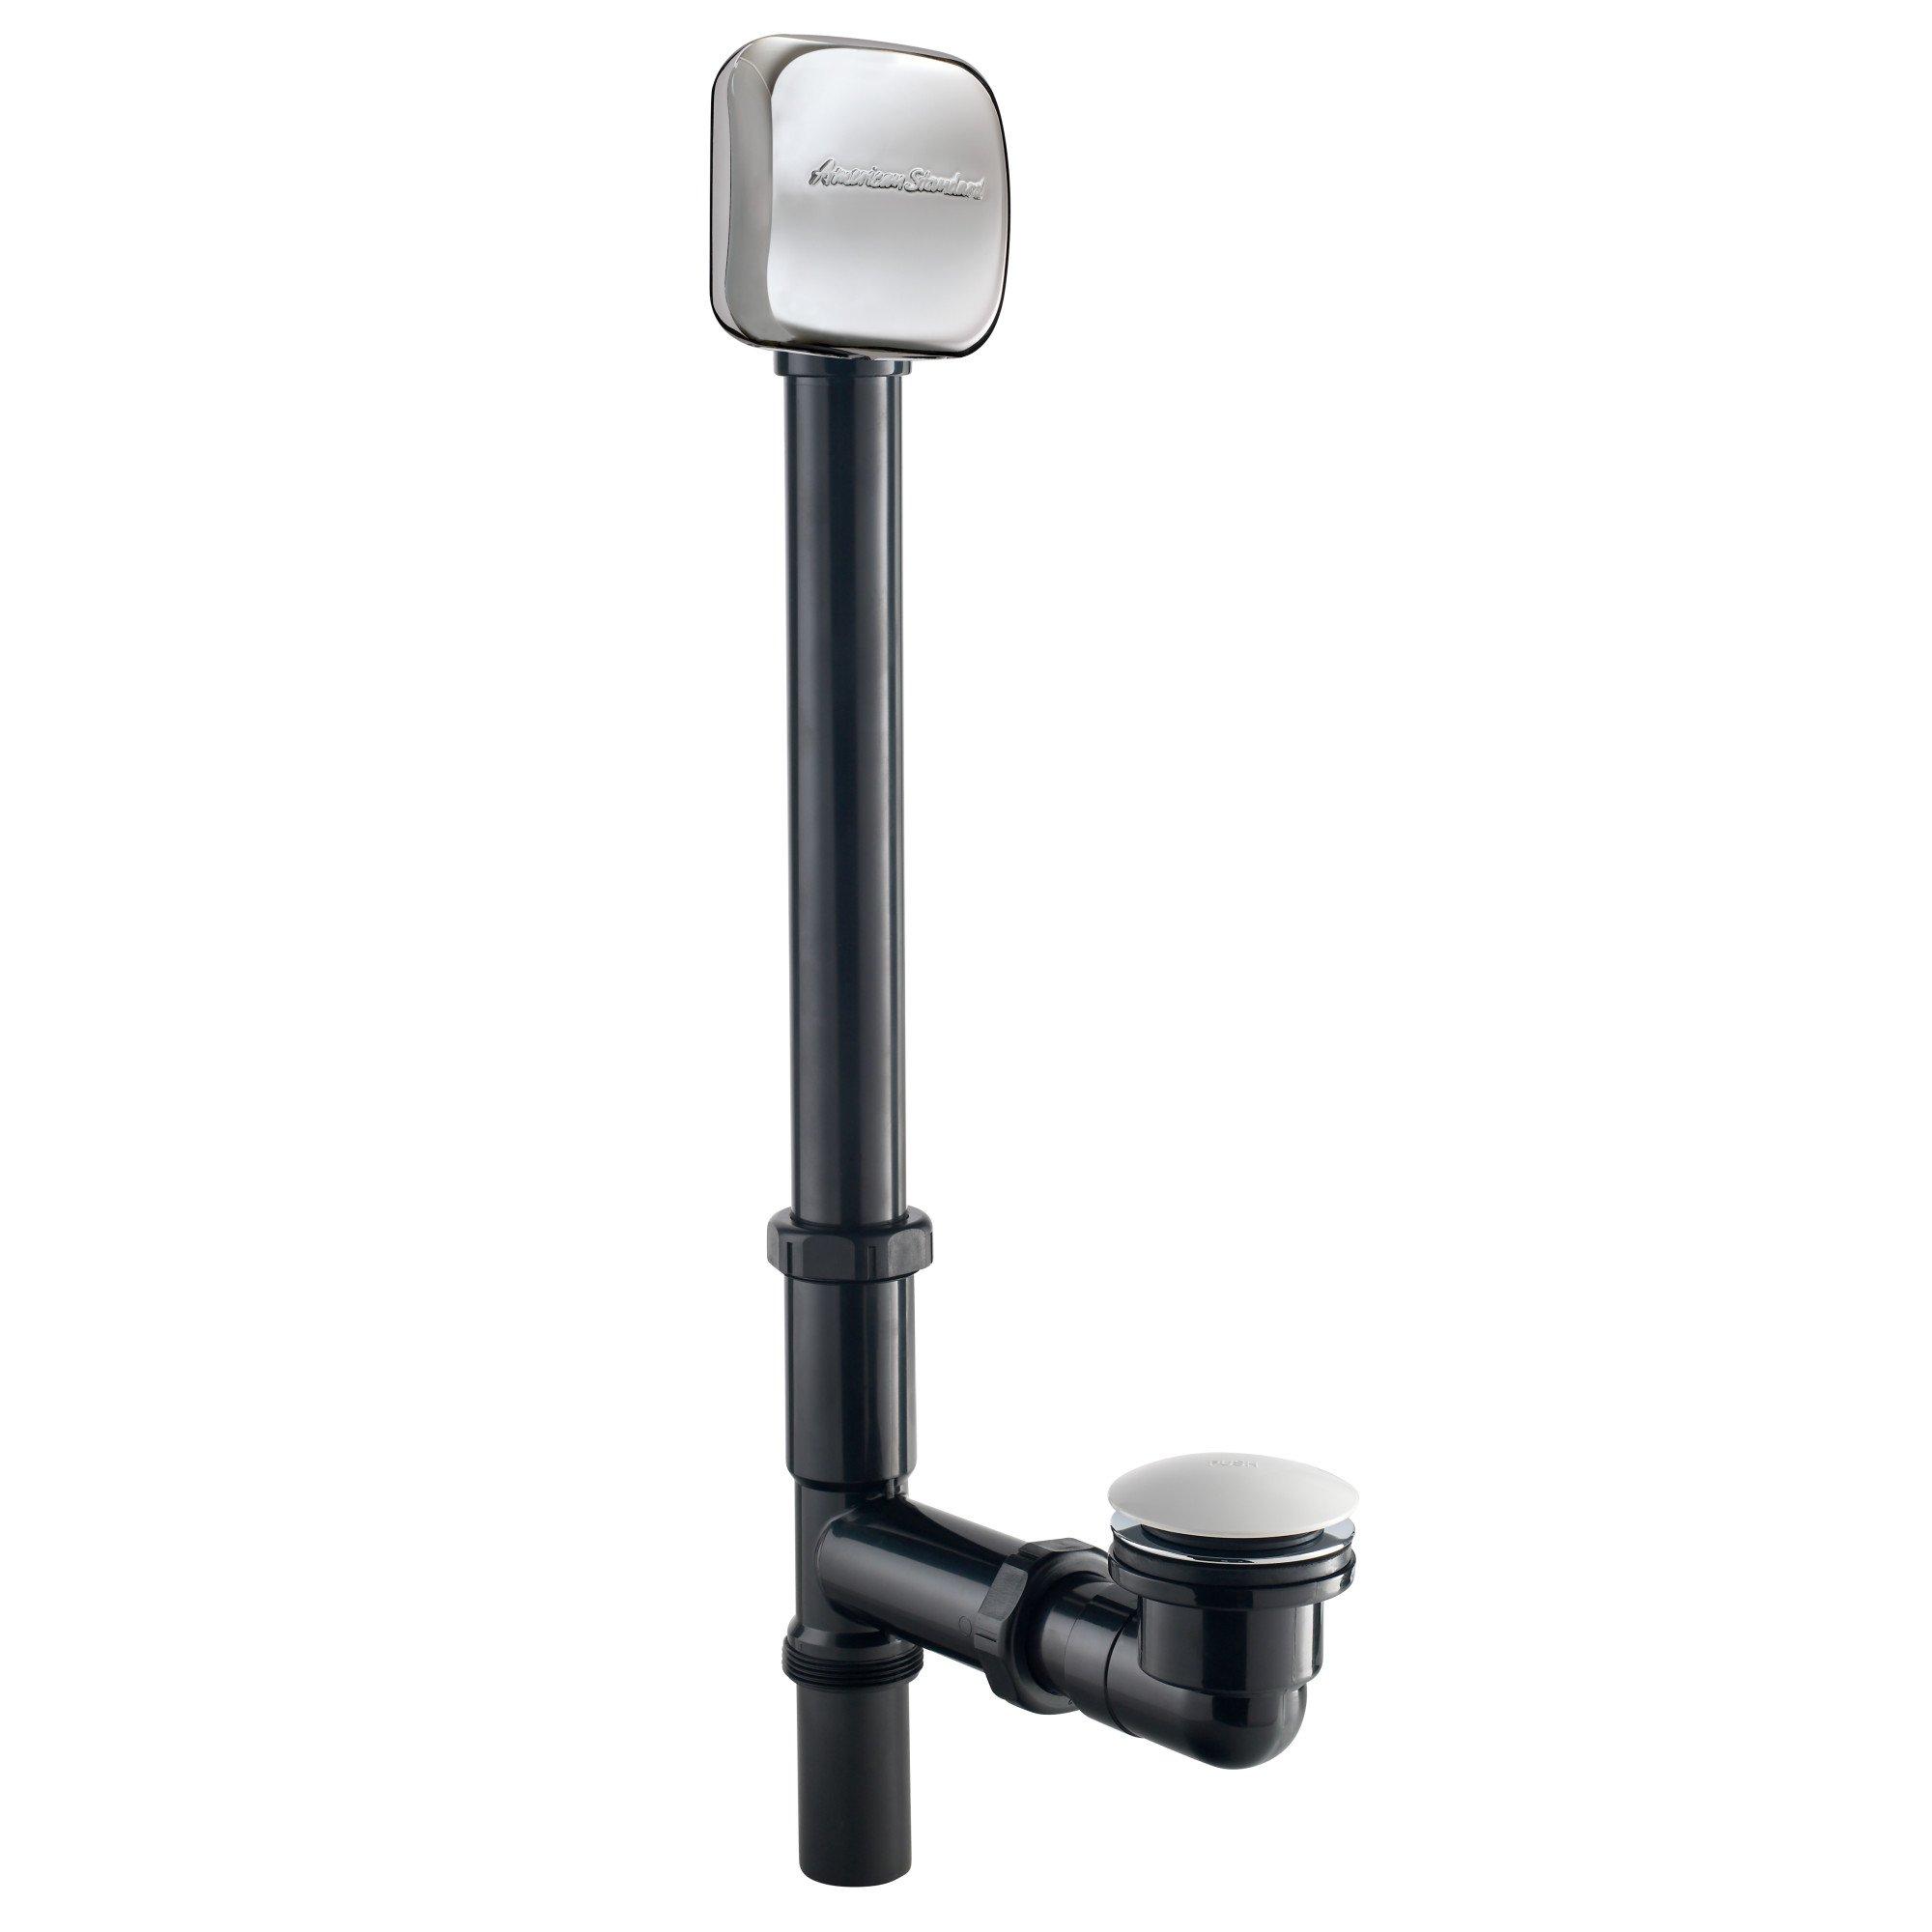 American Standard 1640.305.002 Deep Soak Bath Drain, Polished Chrome